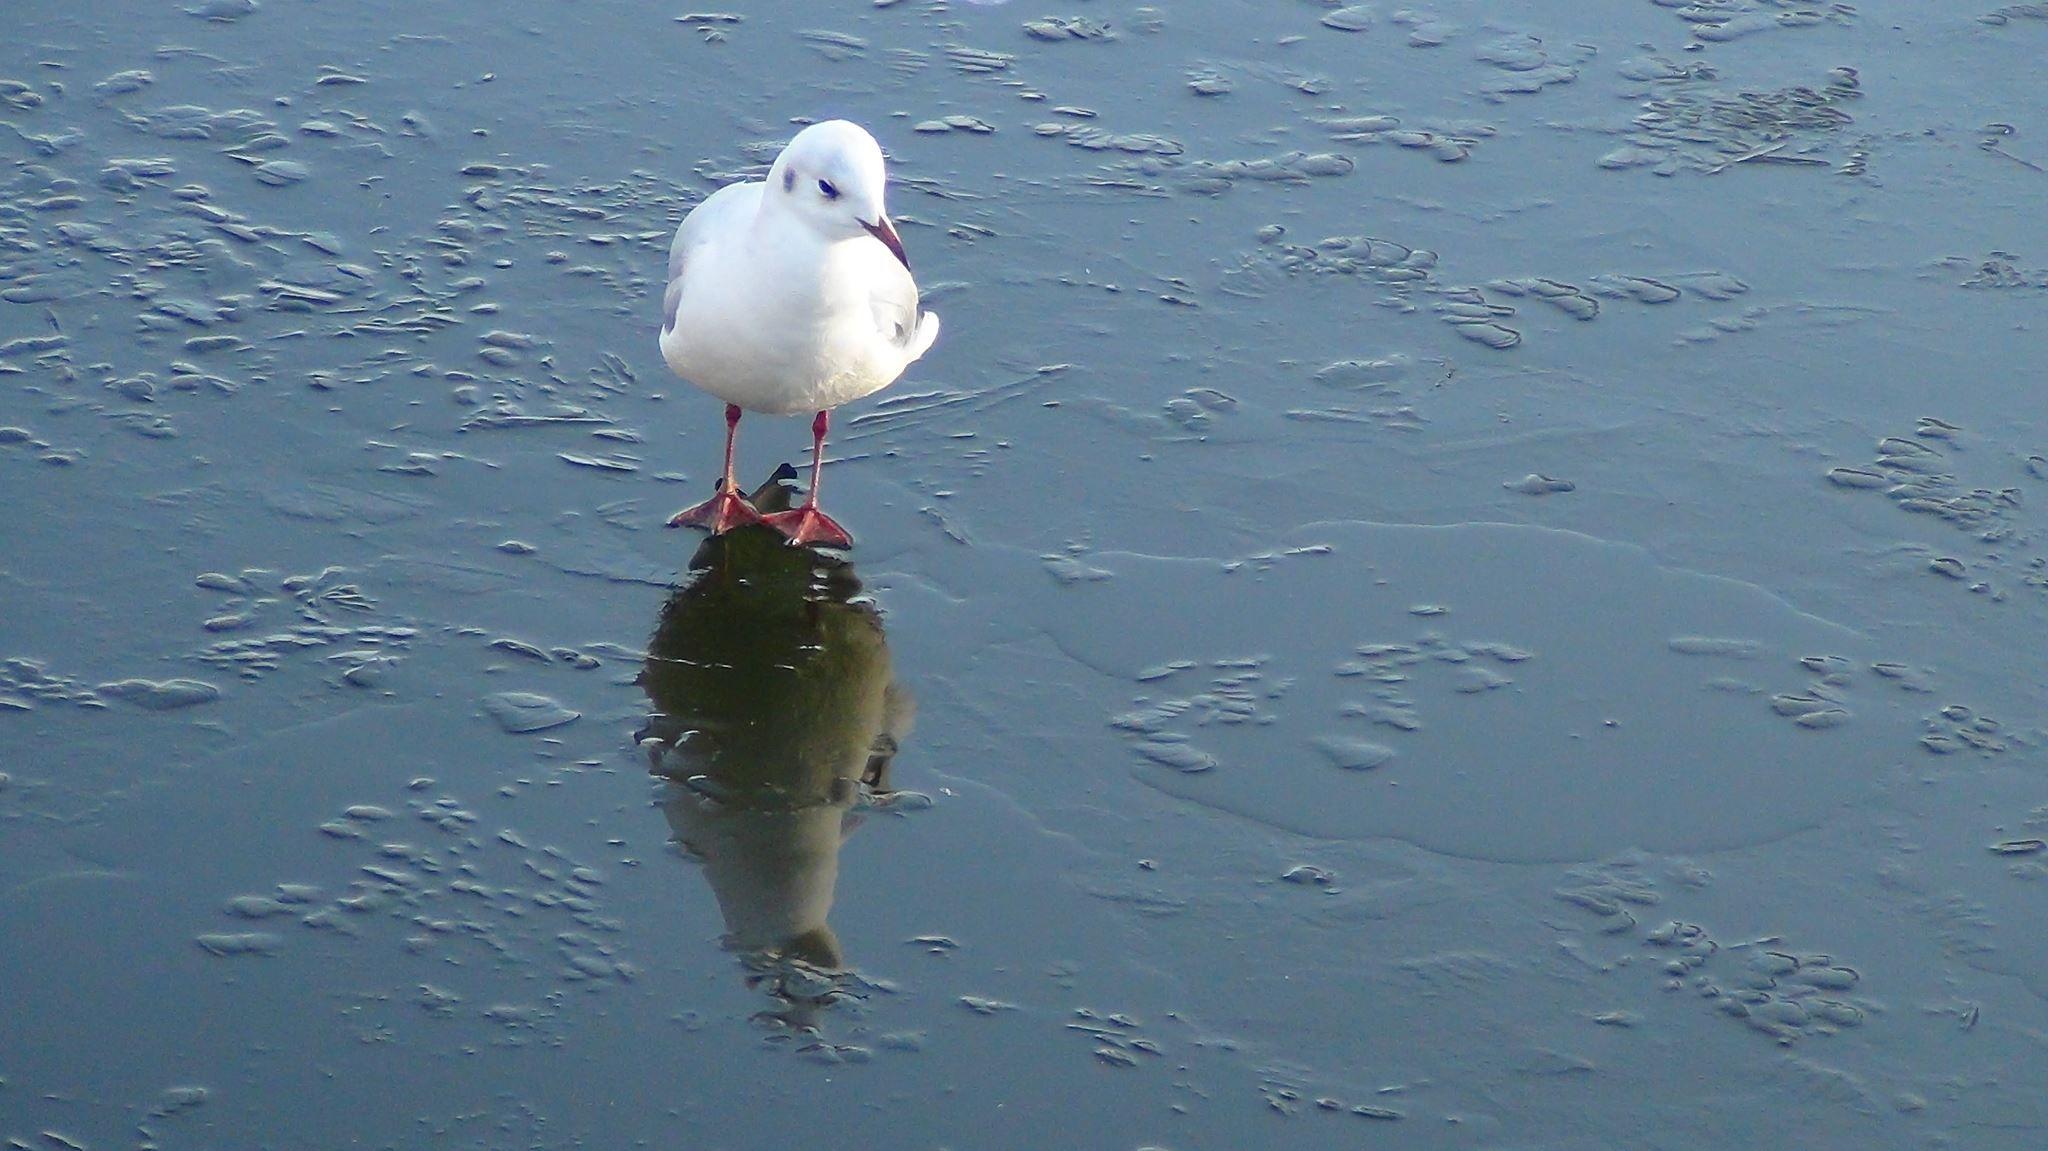 Pas froid aux pattes ! #london #londres #frozenlake #bird ©Daniel Sebaihia